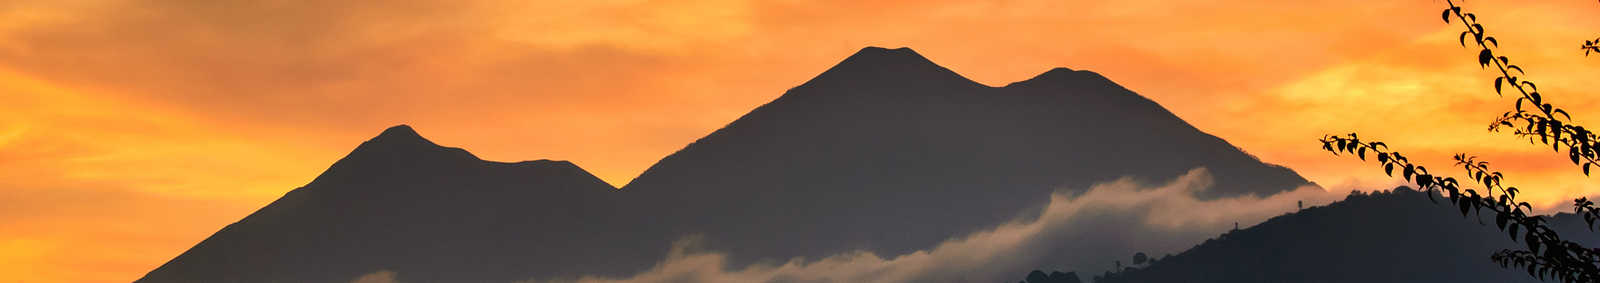 Fuego & Acatenango volcanoes at sunset, near Antigua, Guatemala